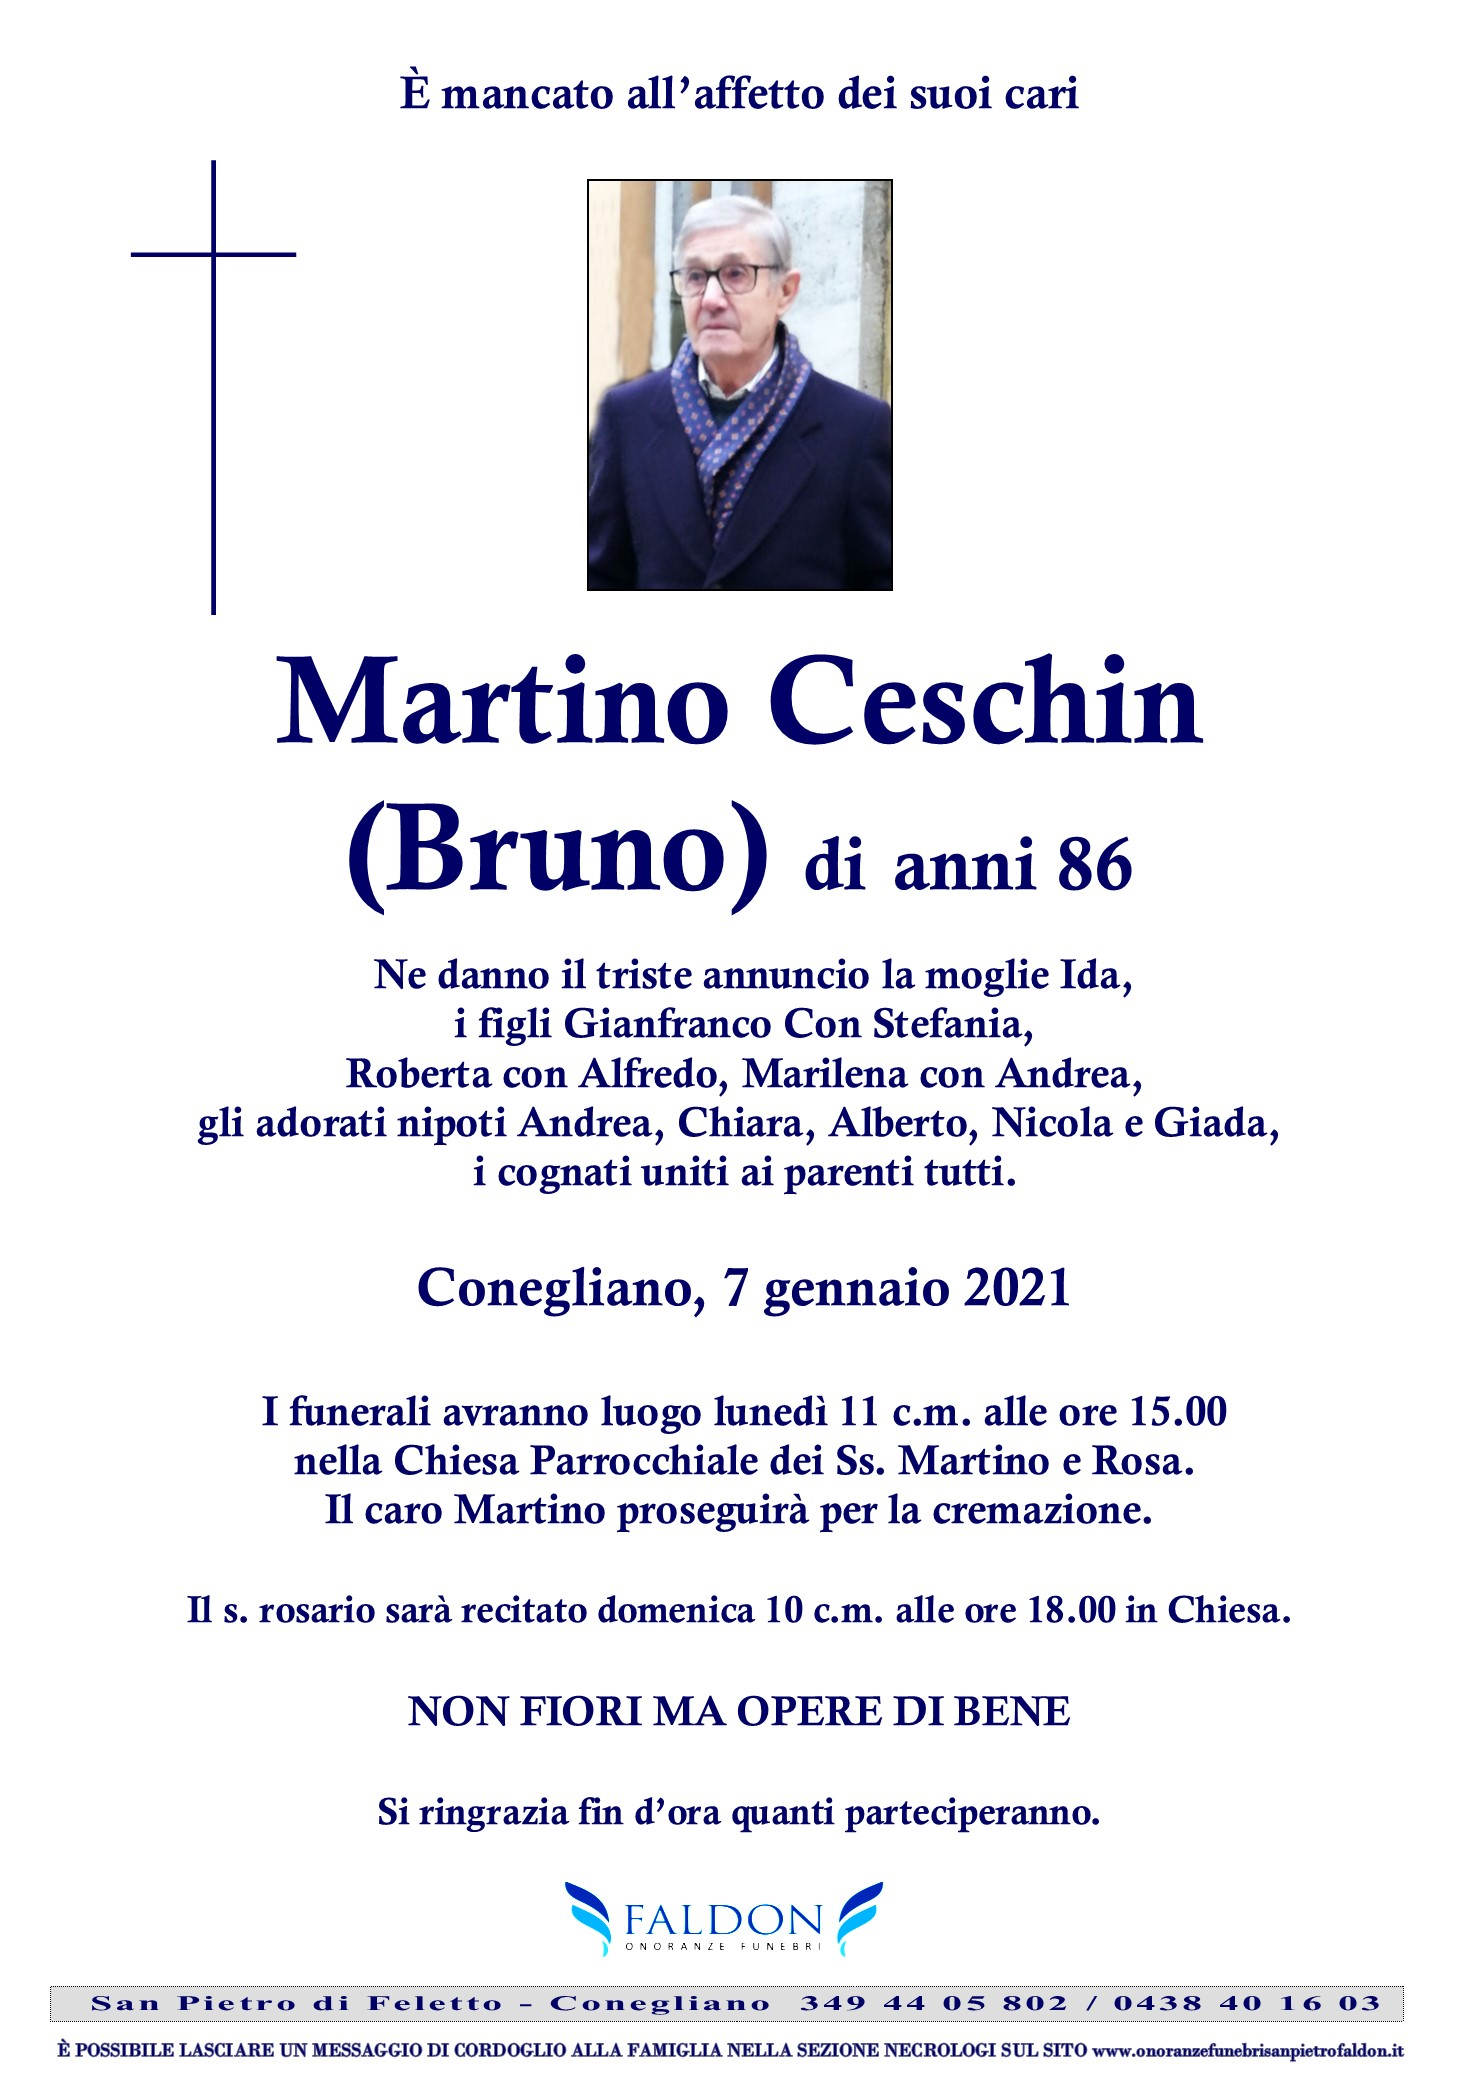 Martino Ceschin